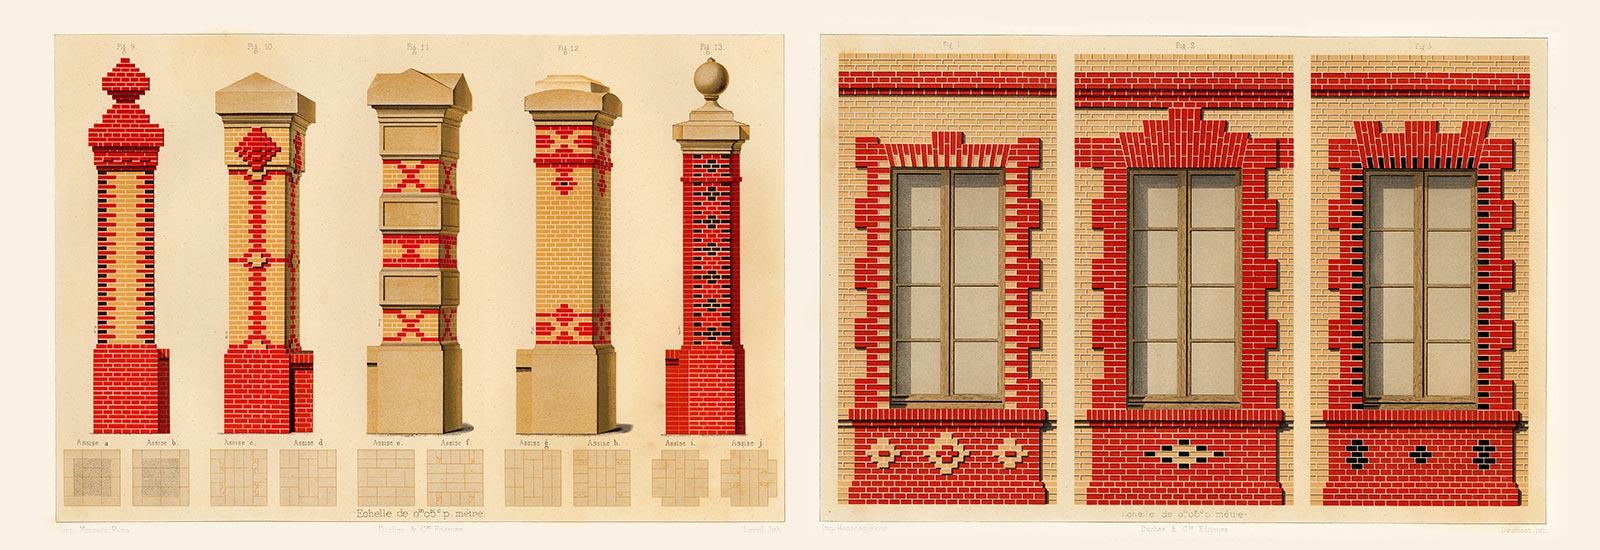 Узоры из кирпича для фасадов дома